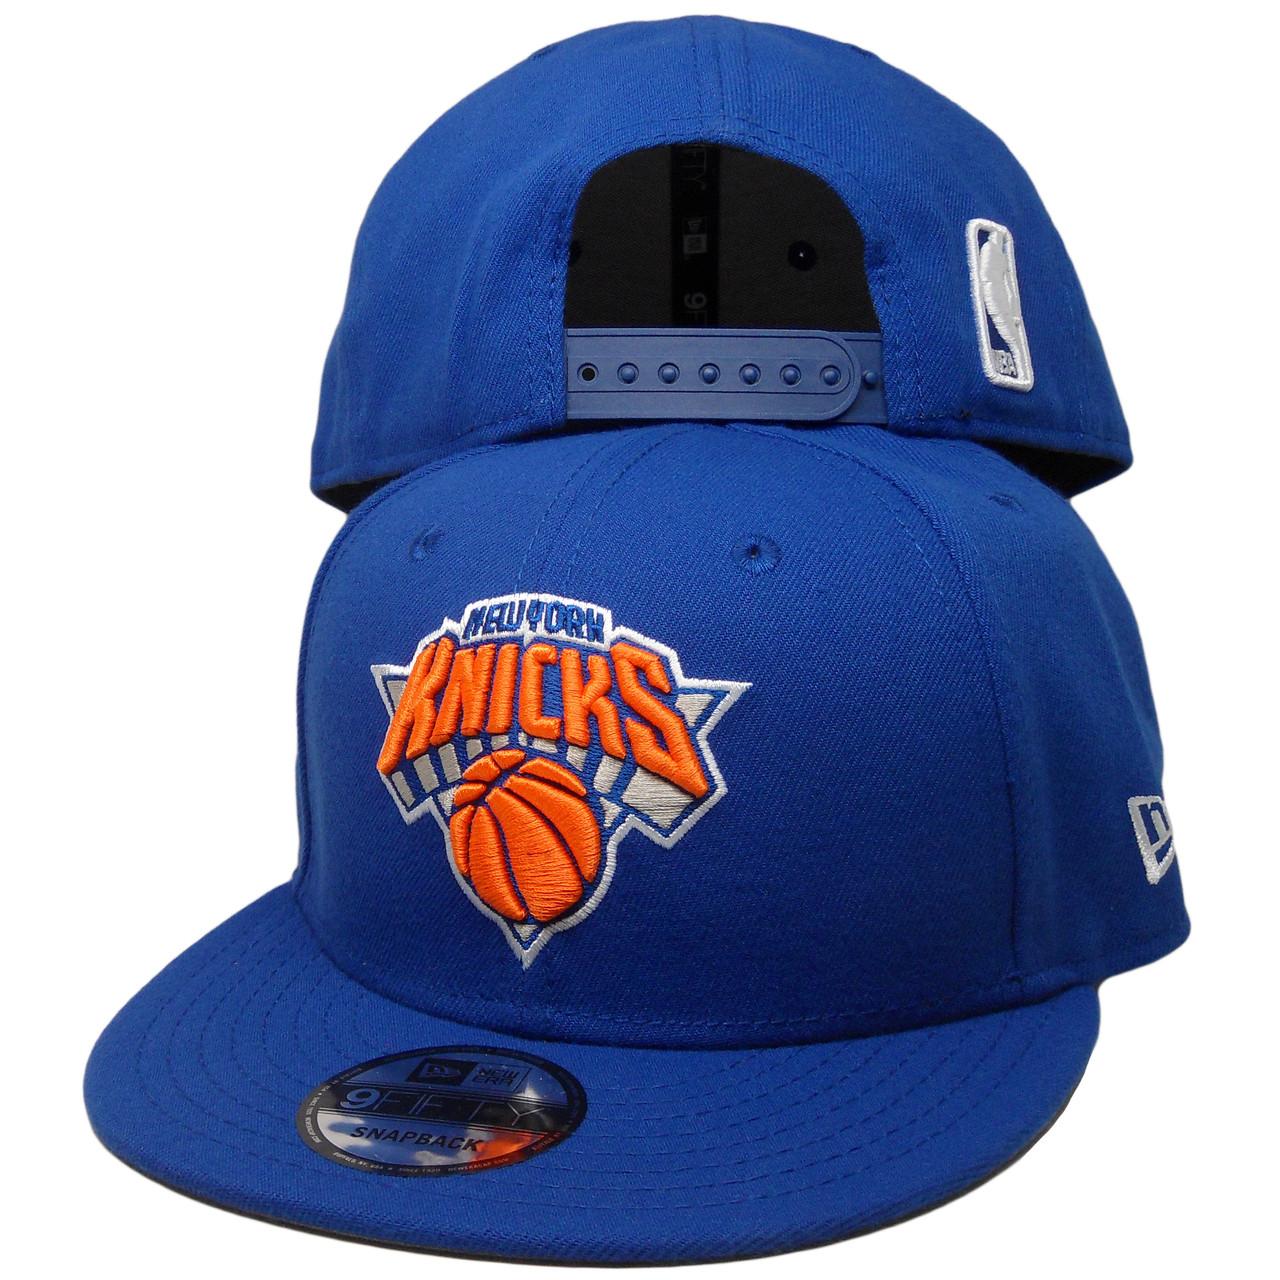 official photos 05c74 c7d01 New York Knicks New Era 9Fifty Basic Snapback - Royal, Orange, White